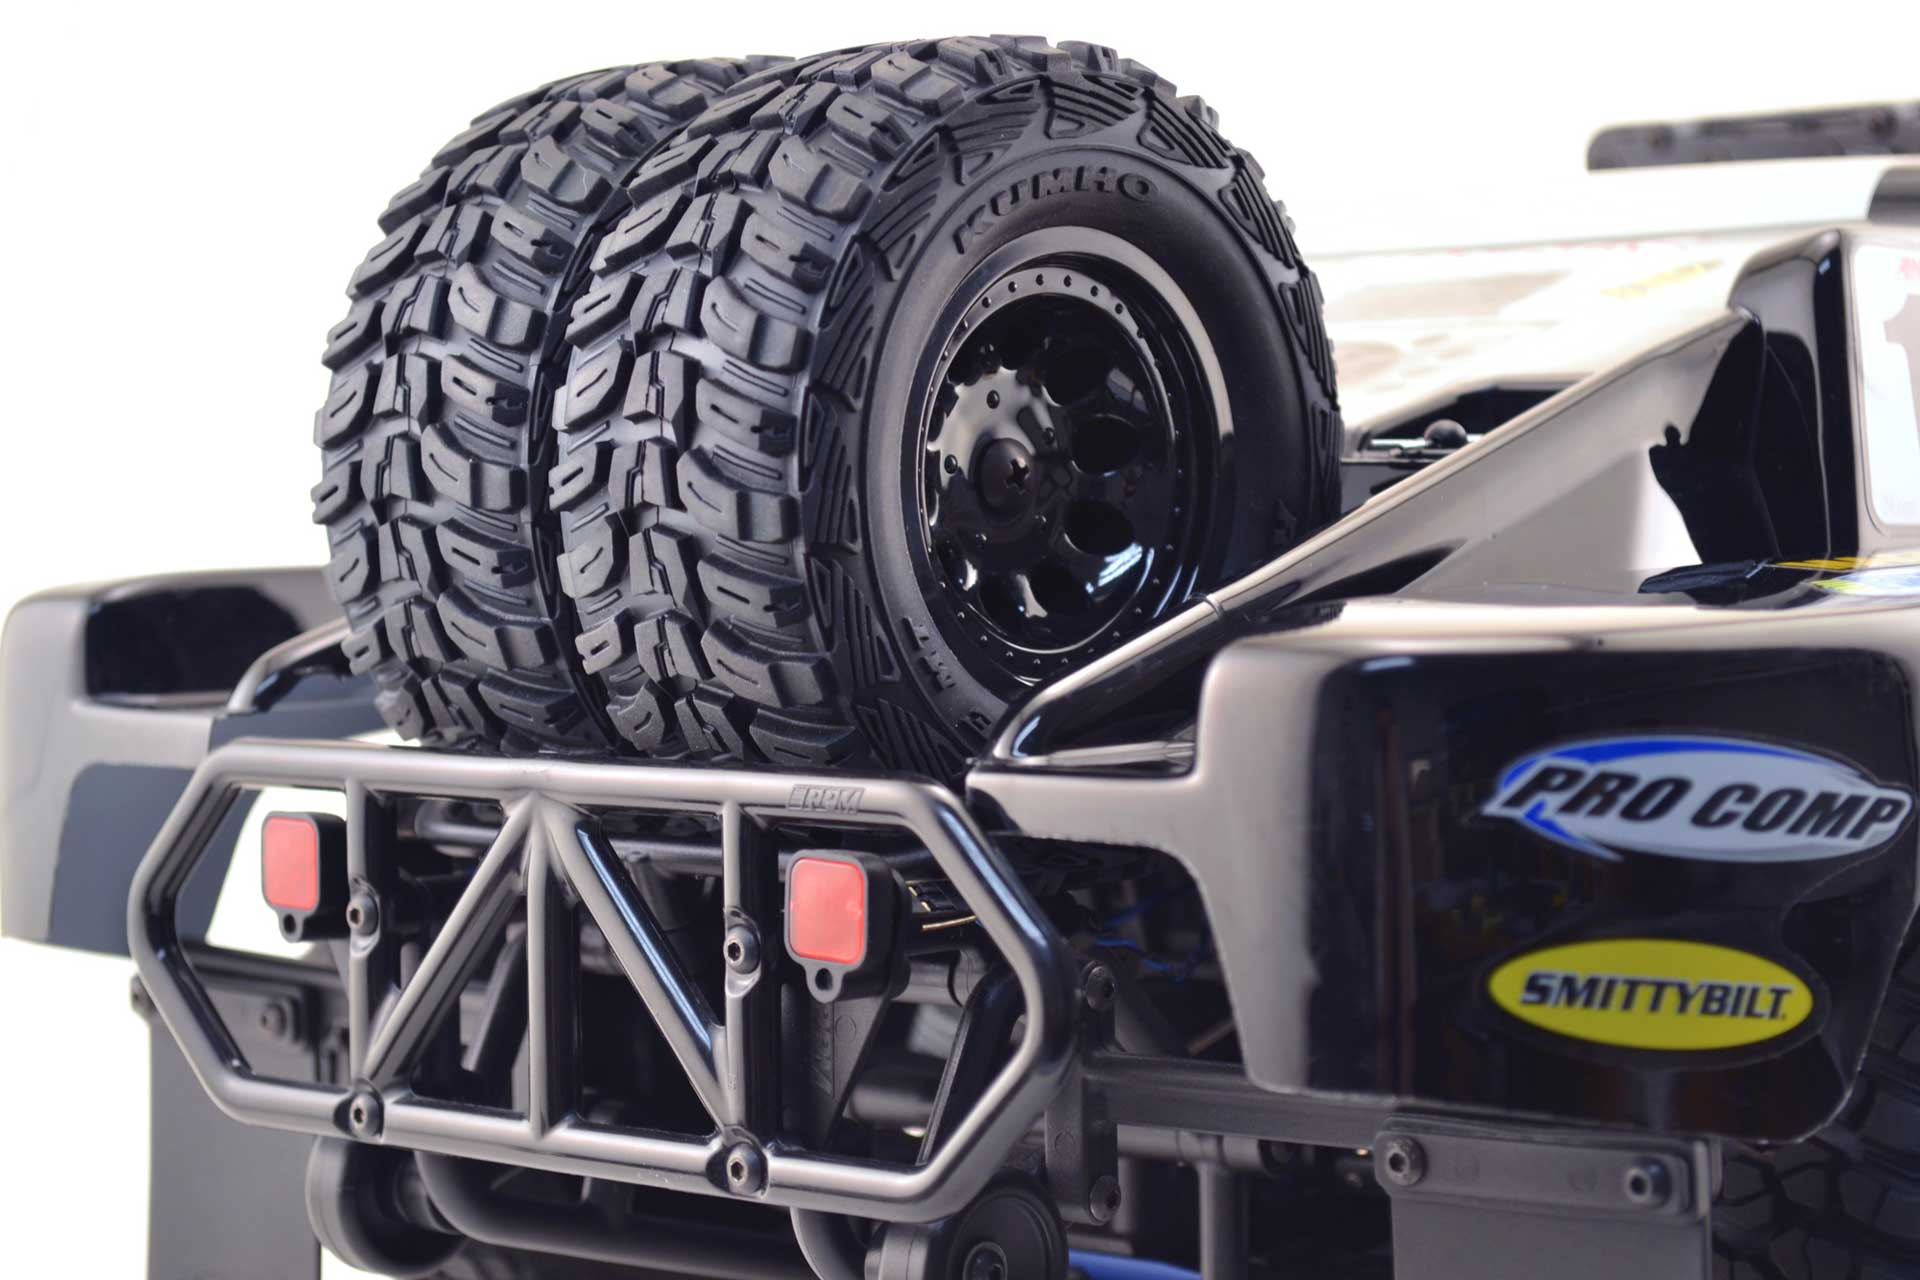 RPM DOPPELTER RESERVERAD-HALTER TRAXXAS SLASH 2WD & 4X4